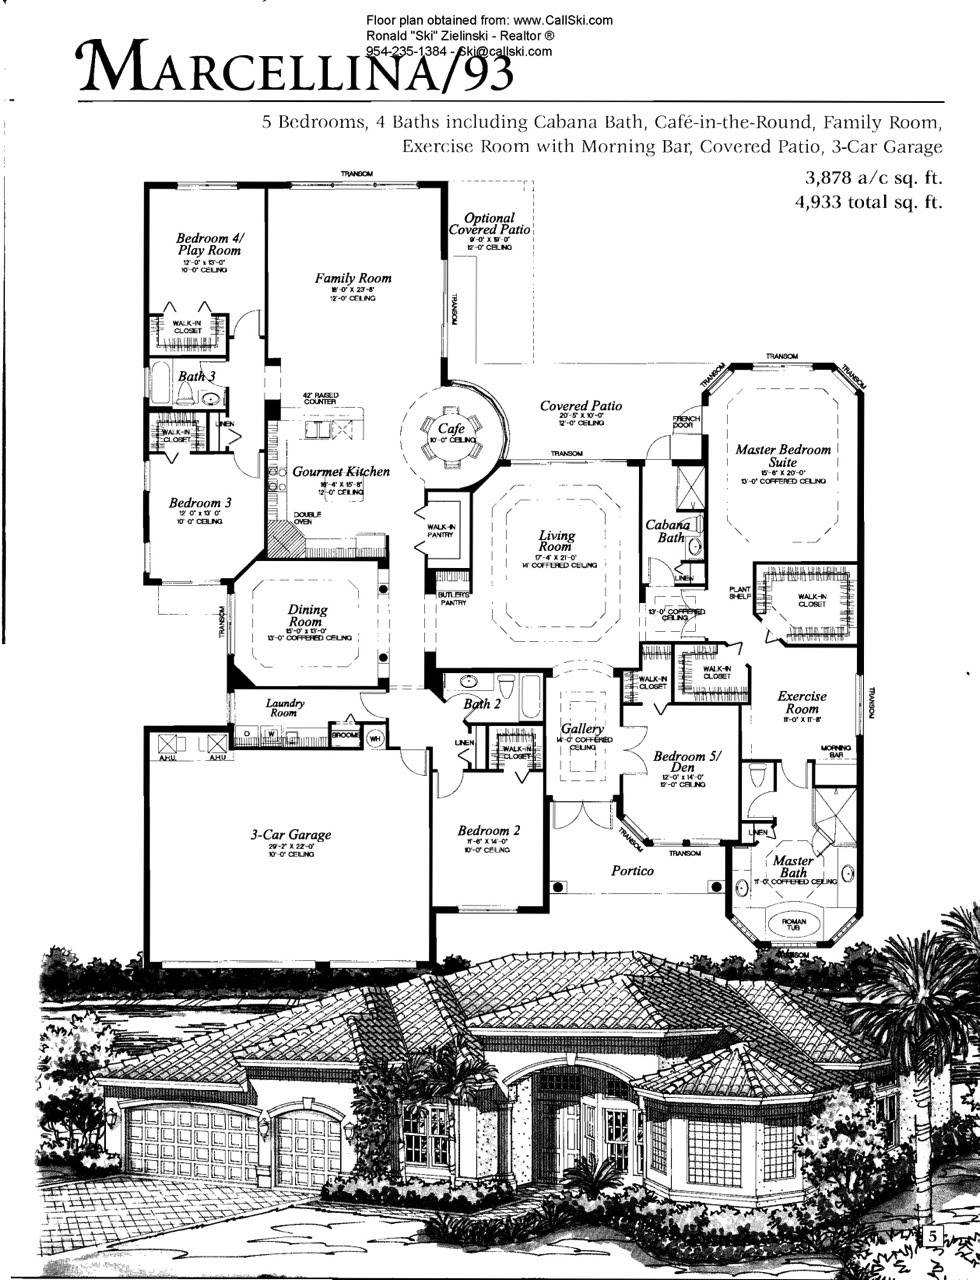 Egret Plan Florida Real Estate Gl Homes - Free Photos